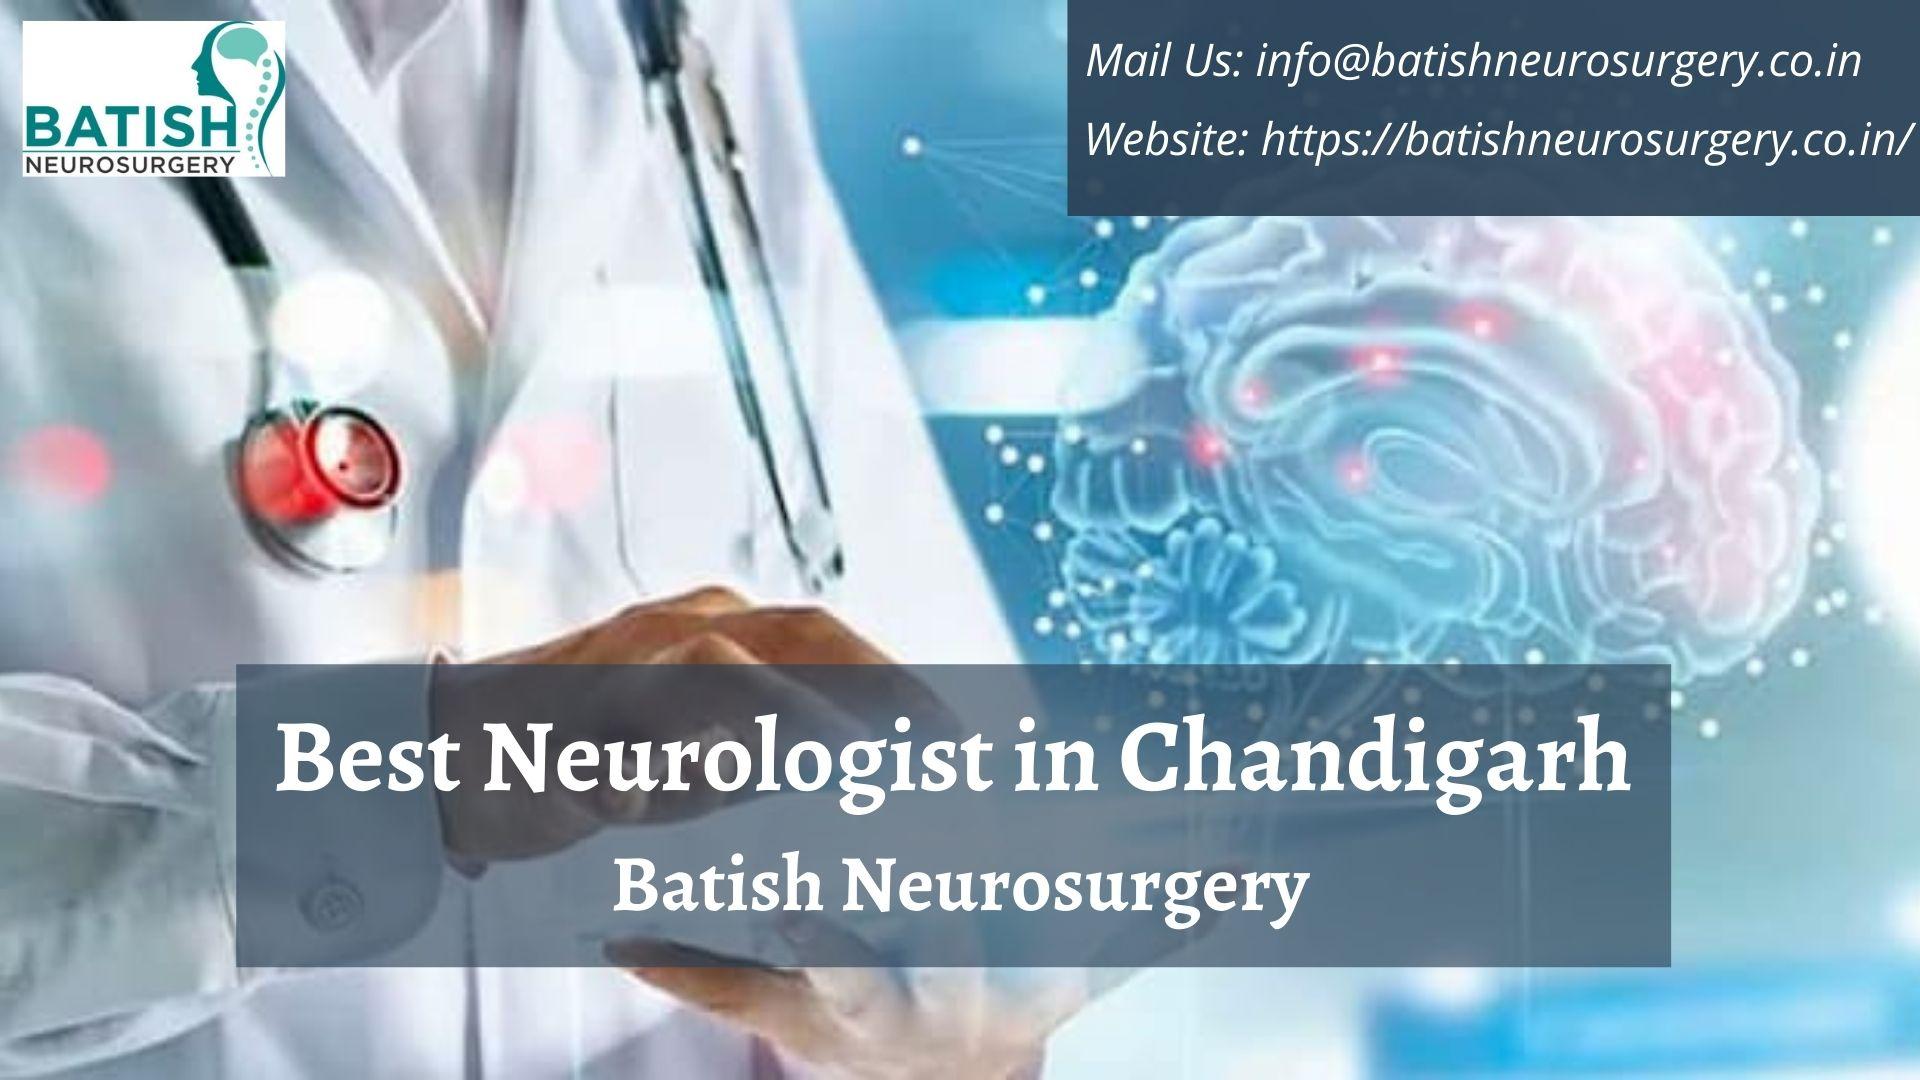 Best Neurologist in Chandigarh | Batish Neurosurgery